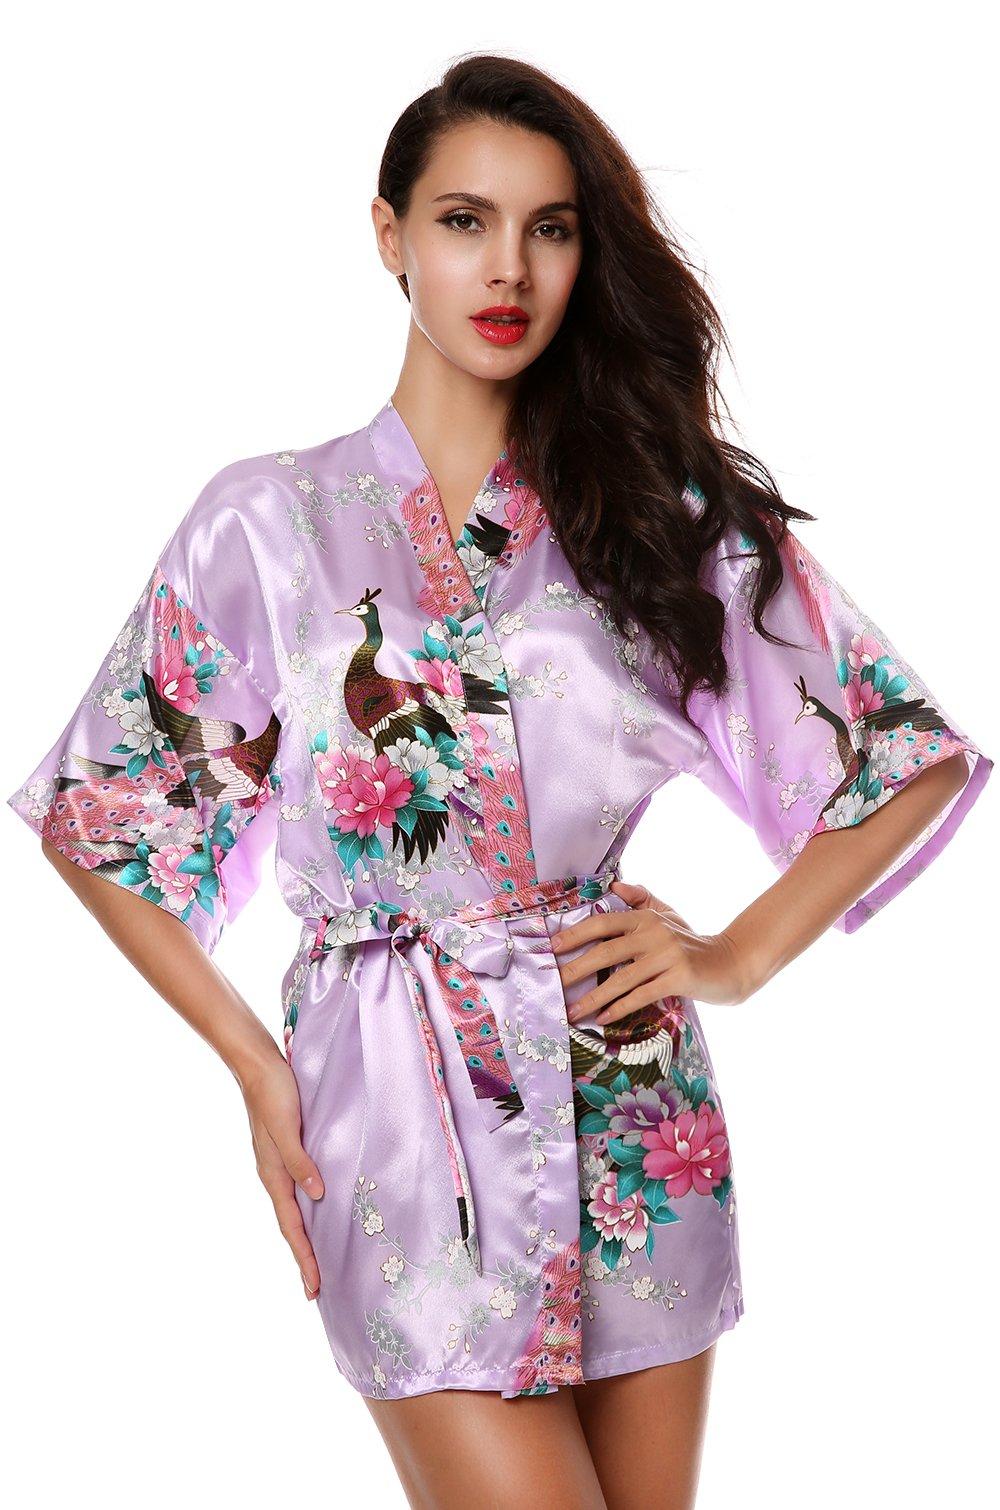 wearella Women Kimono Short Robe Peacock and Blossoms Silk Nightwear Bathrobe (XXL, Style 2- Light Purple)